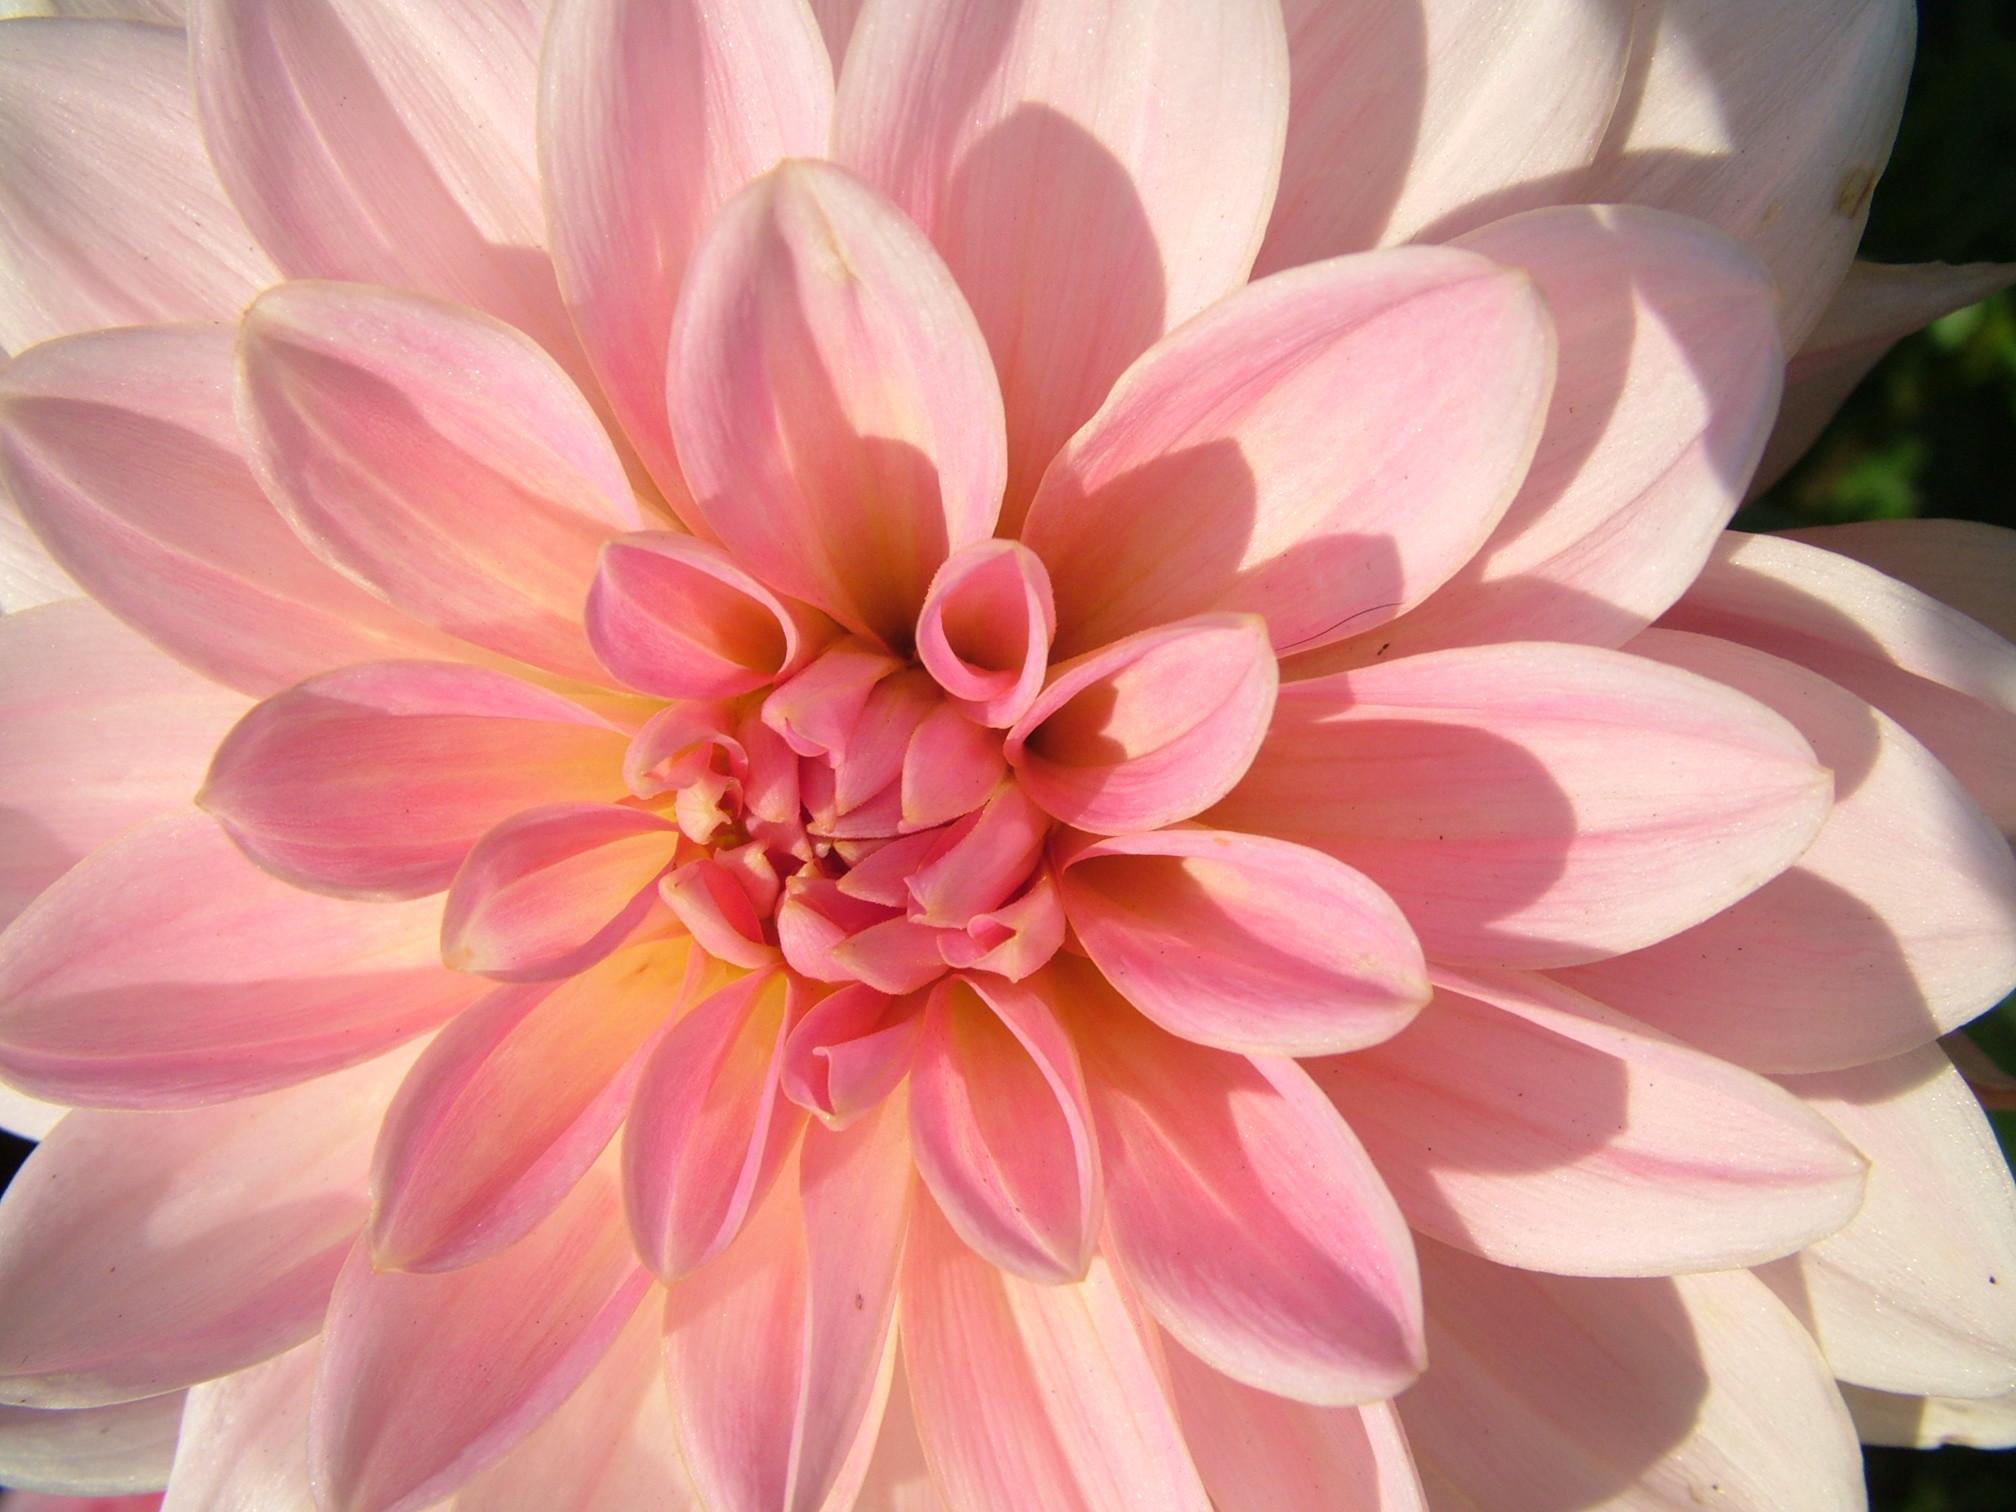 Pink flower desktop wallpaper 70 images - Large screen wallpapers free ...